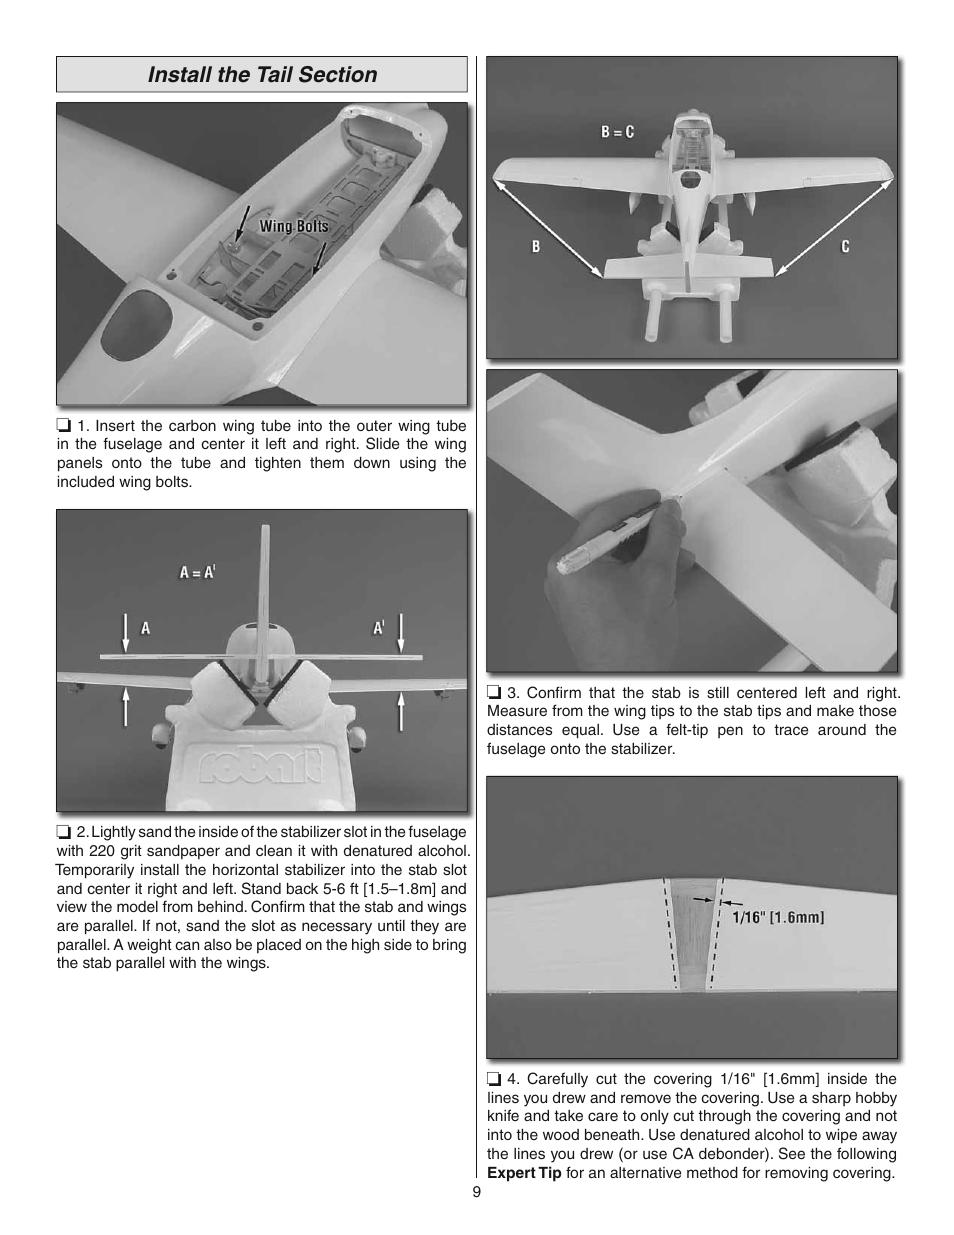 Great Planes Cirrus SR22 Turbo ARF - GPMA1166 User Manual